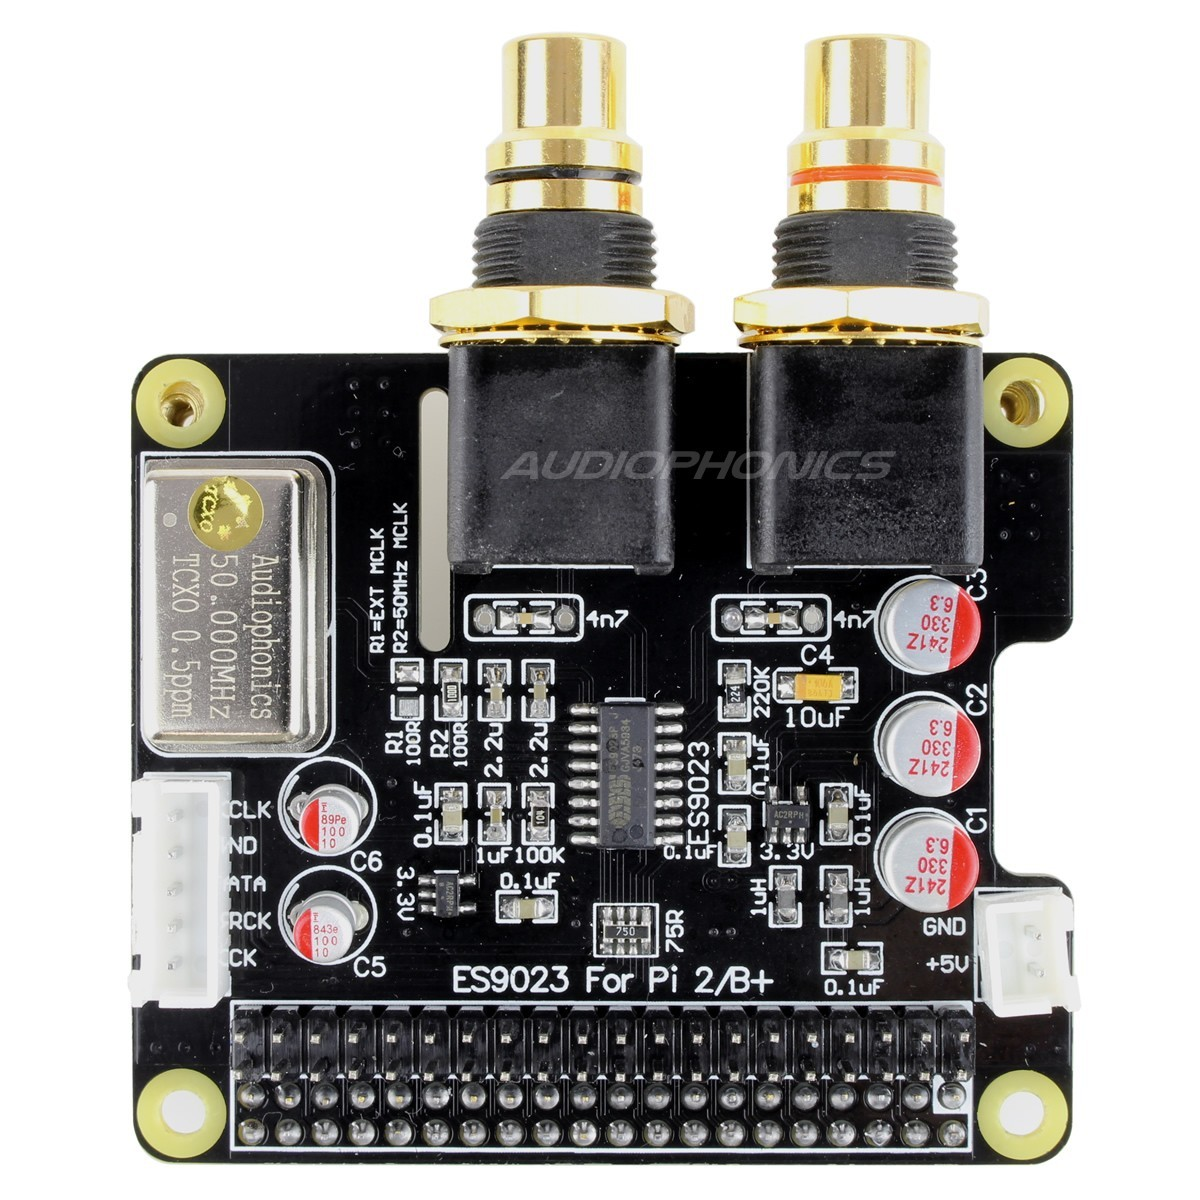 AUDIOPHONICS I-Sabre DAC ES9023 TCXO Raspberry Pi A+ B+ / Pi 3 / Pi 2 / I2S